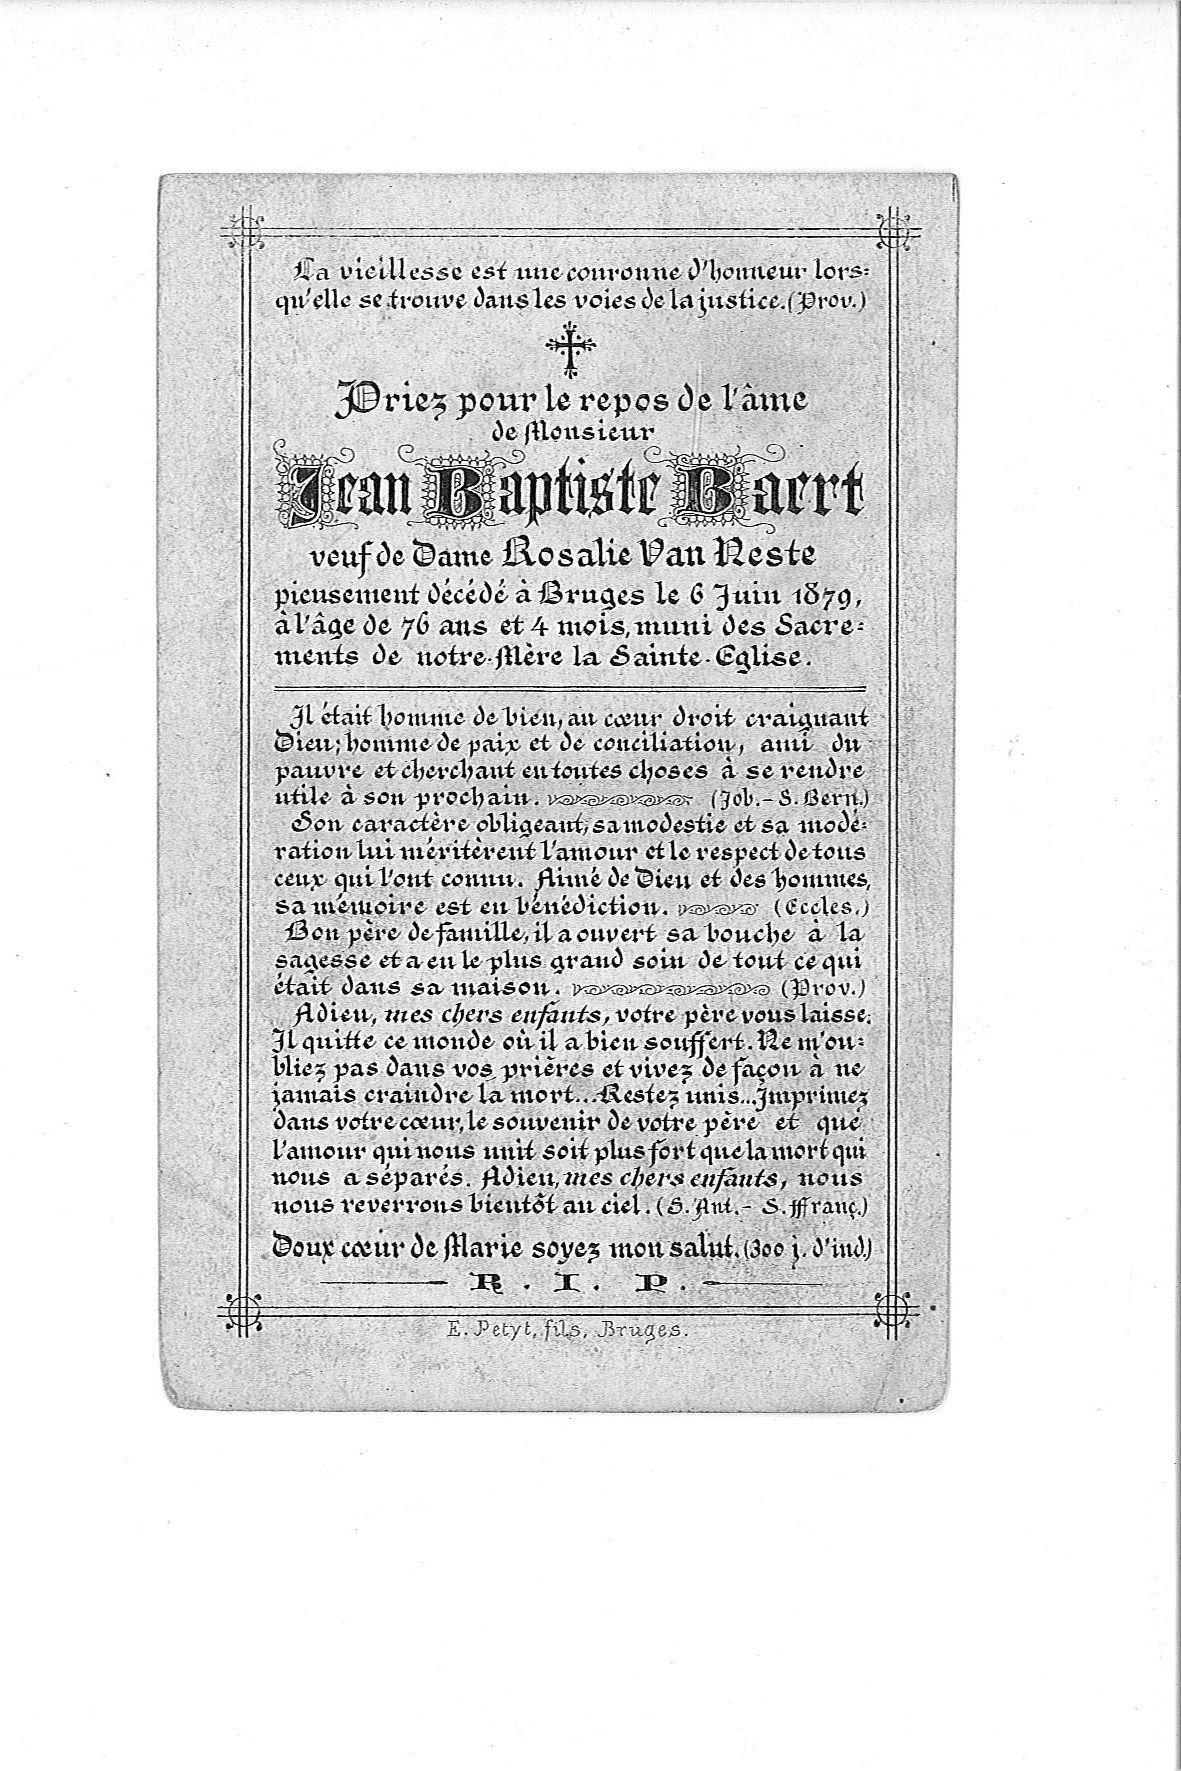 jean-baptiste(1879)-20090112152832_00002.jpg